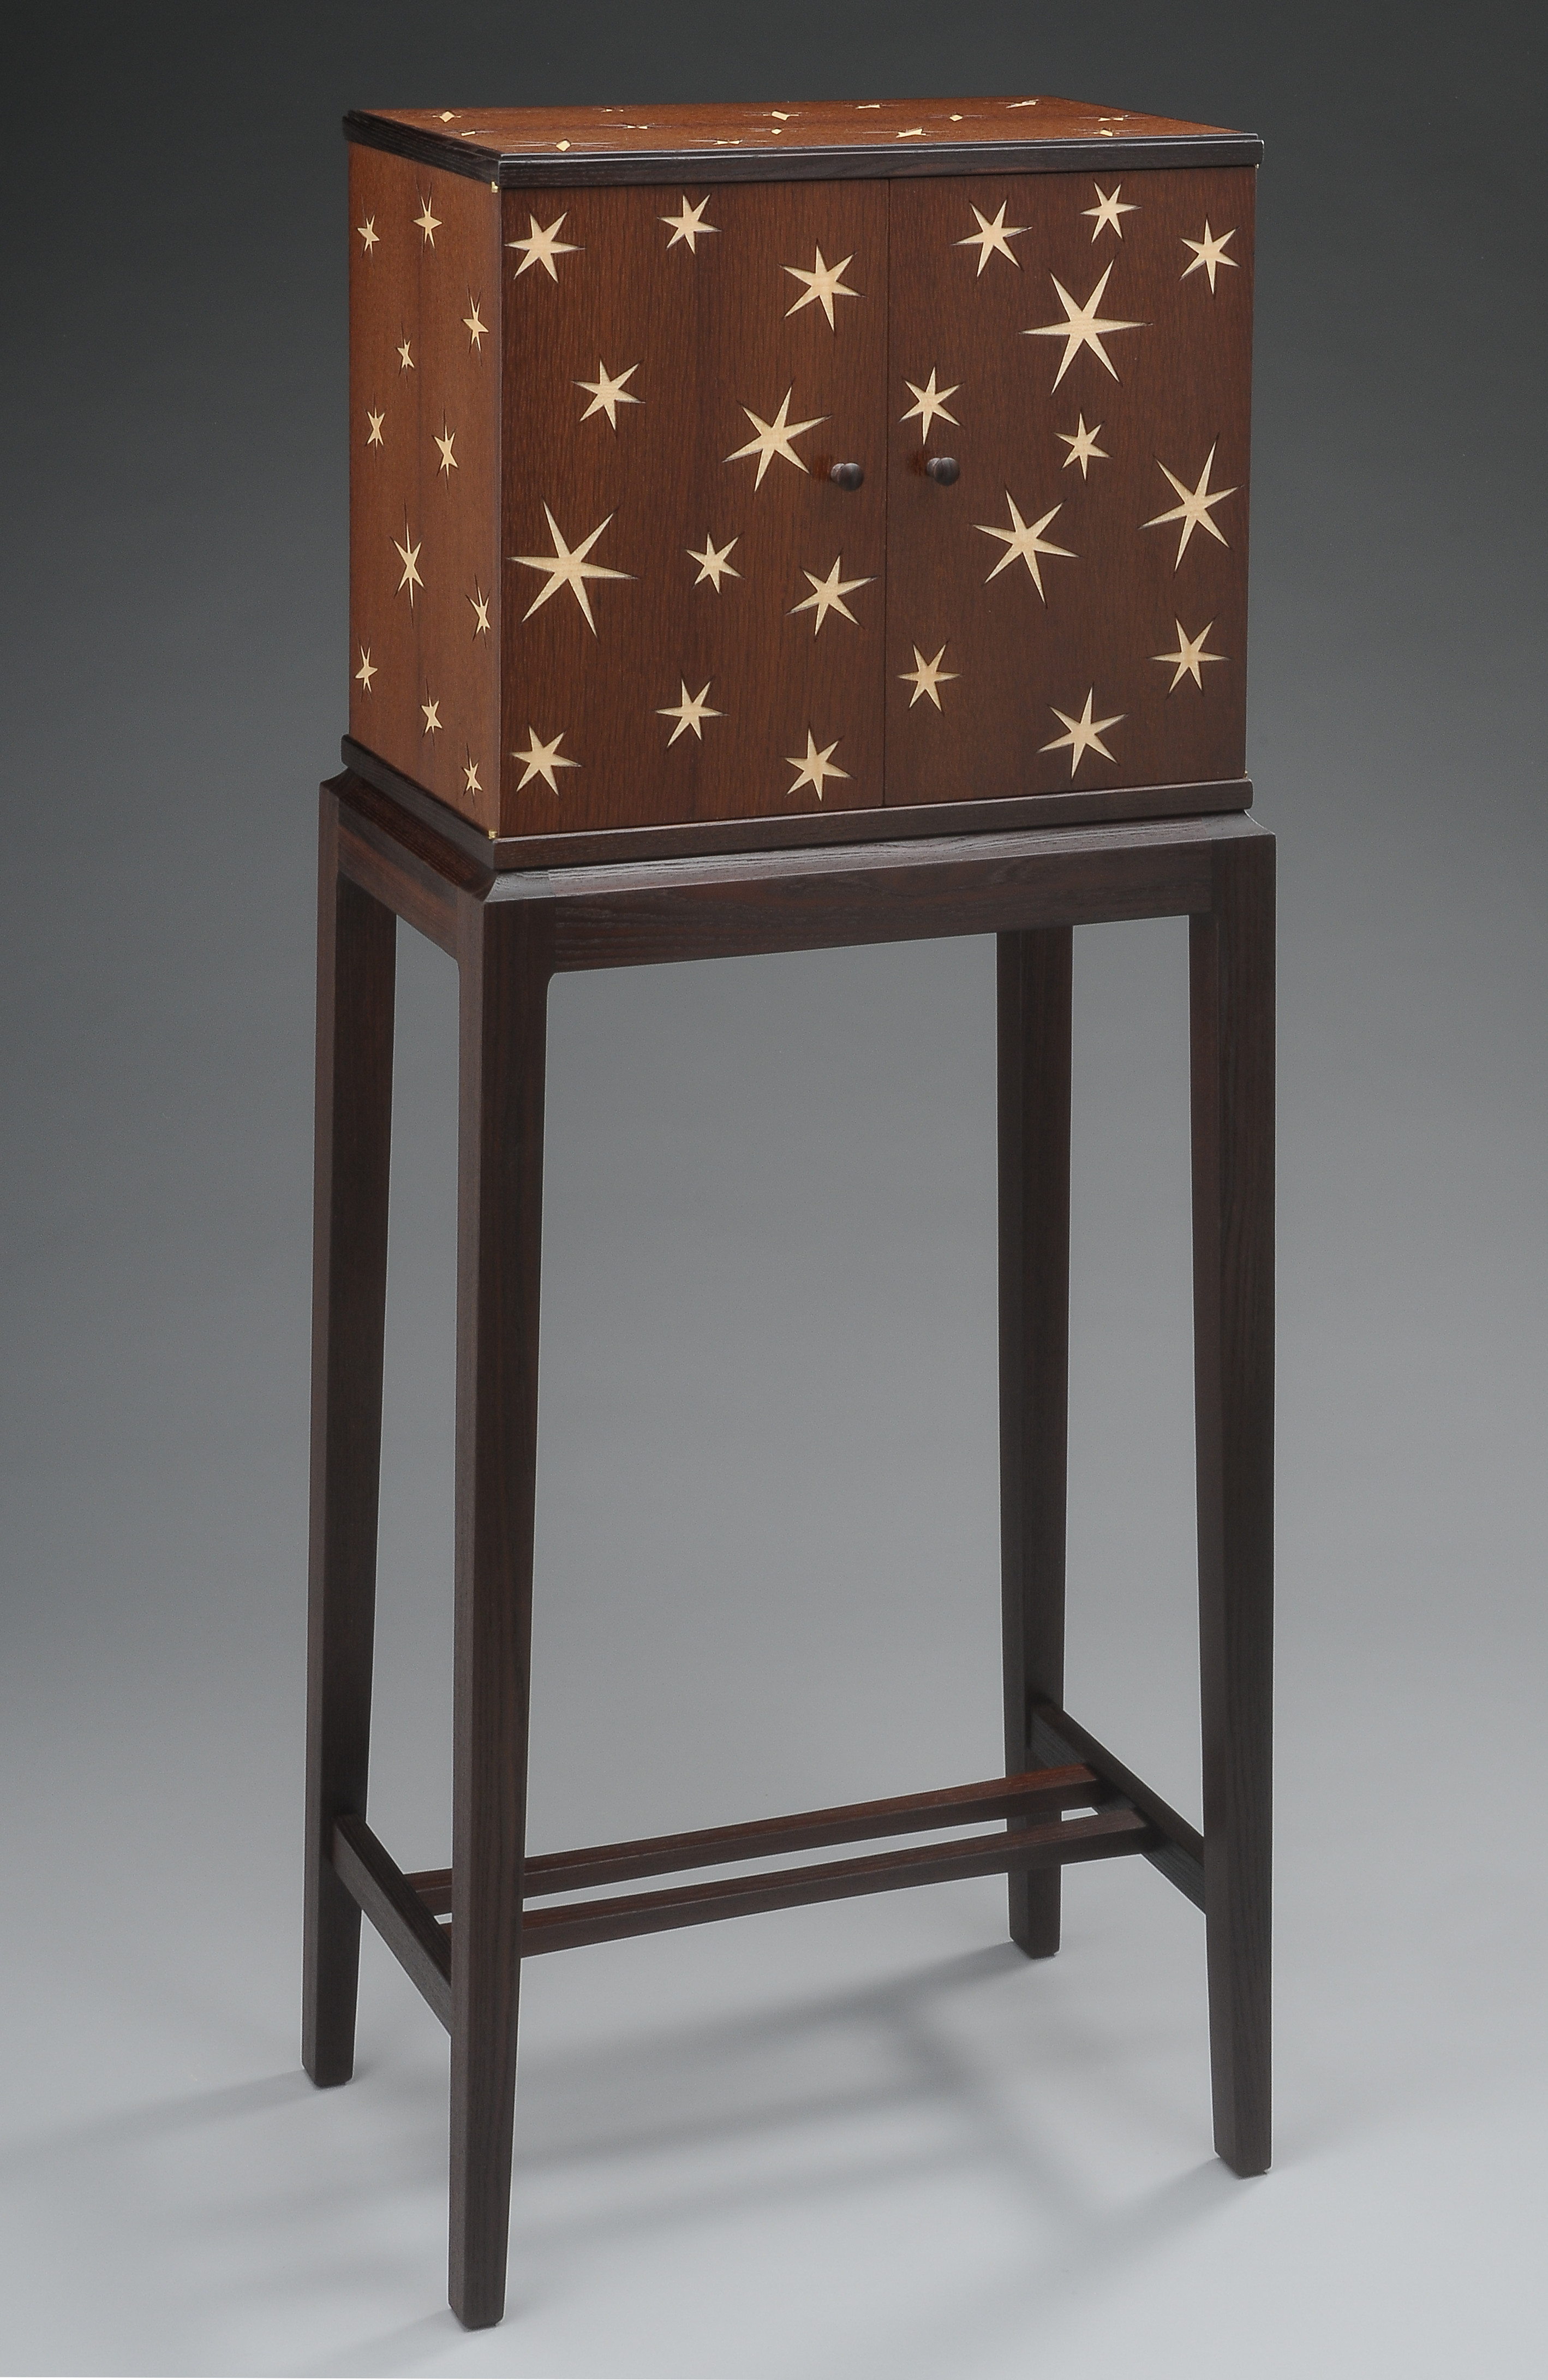 custom handmade jewelery cabinet by furniture master tim coleman